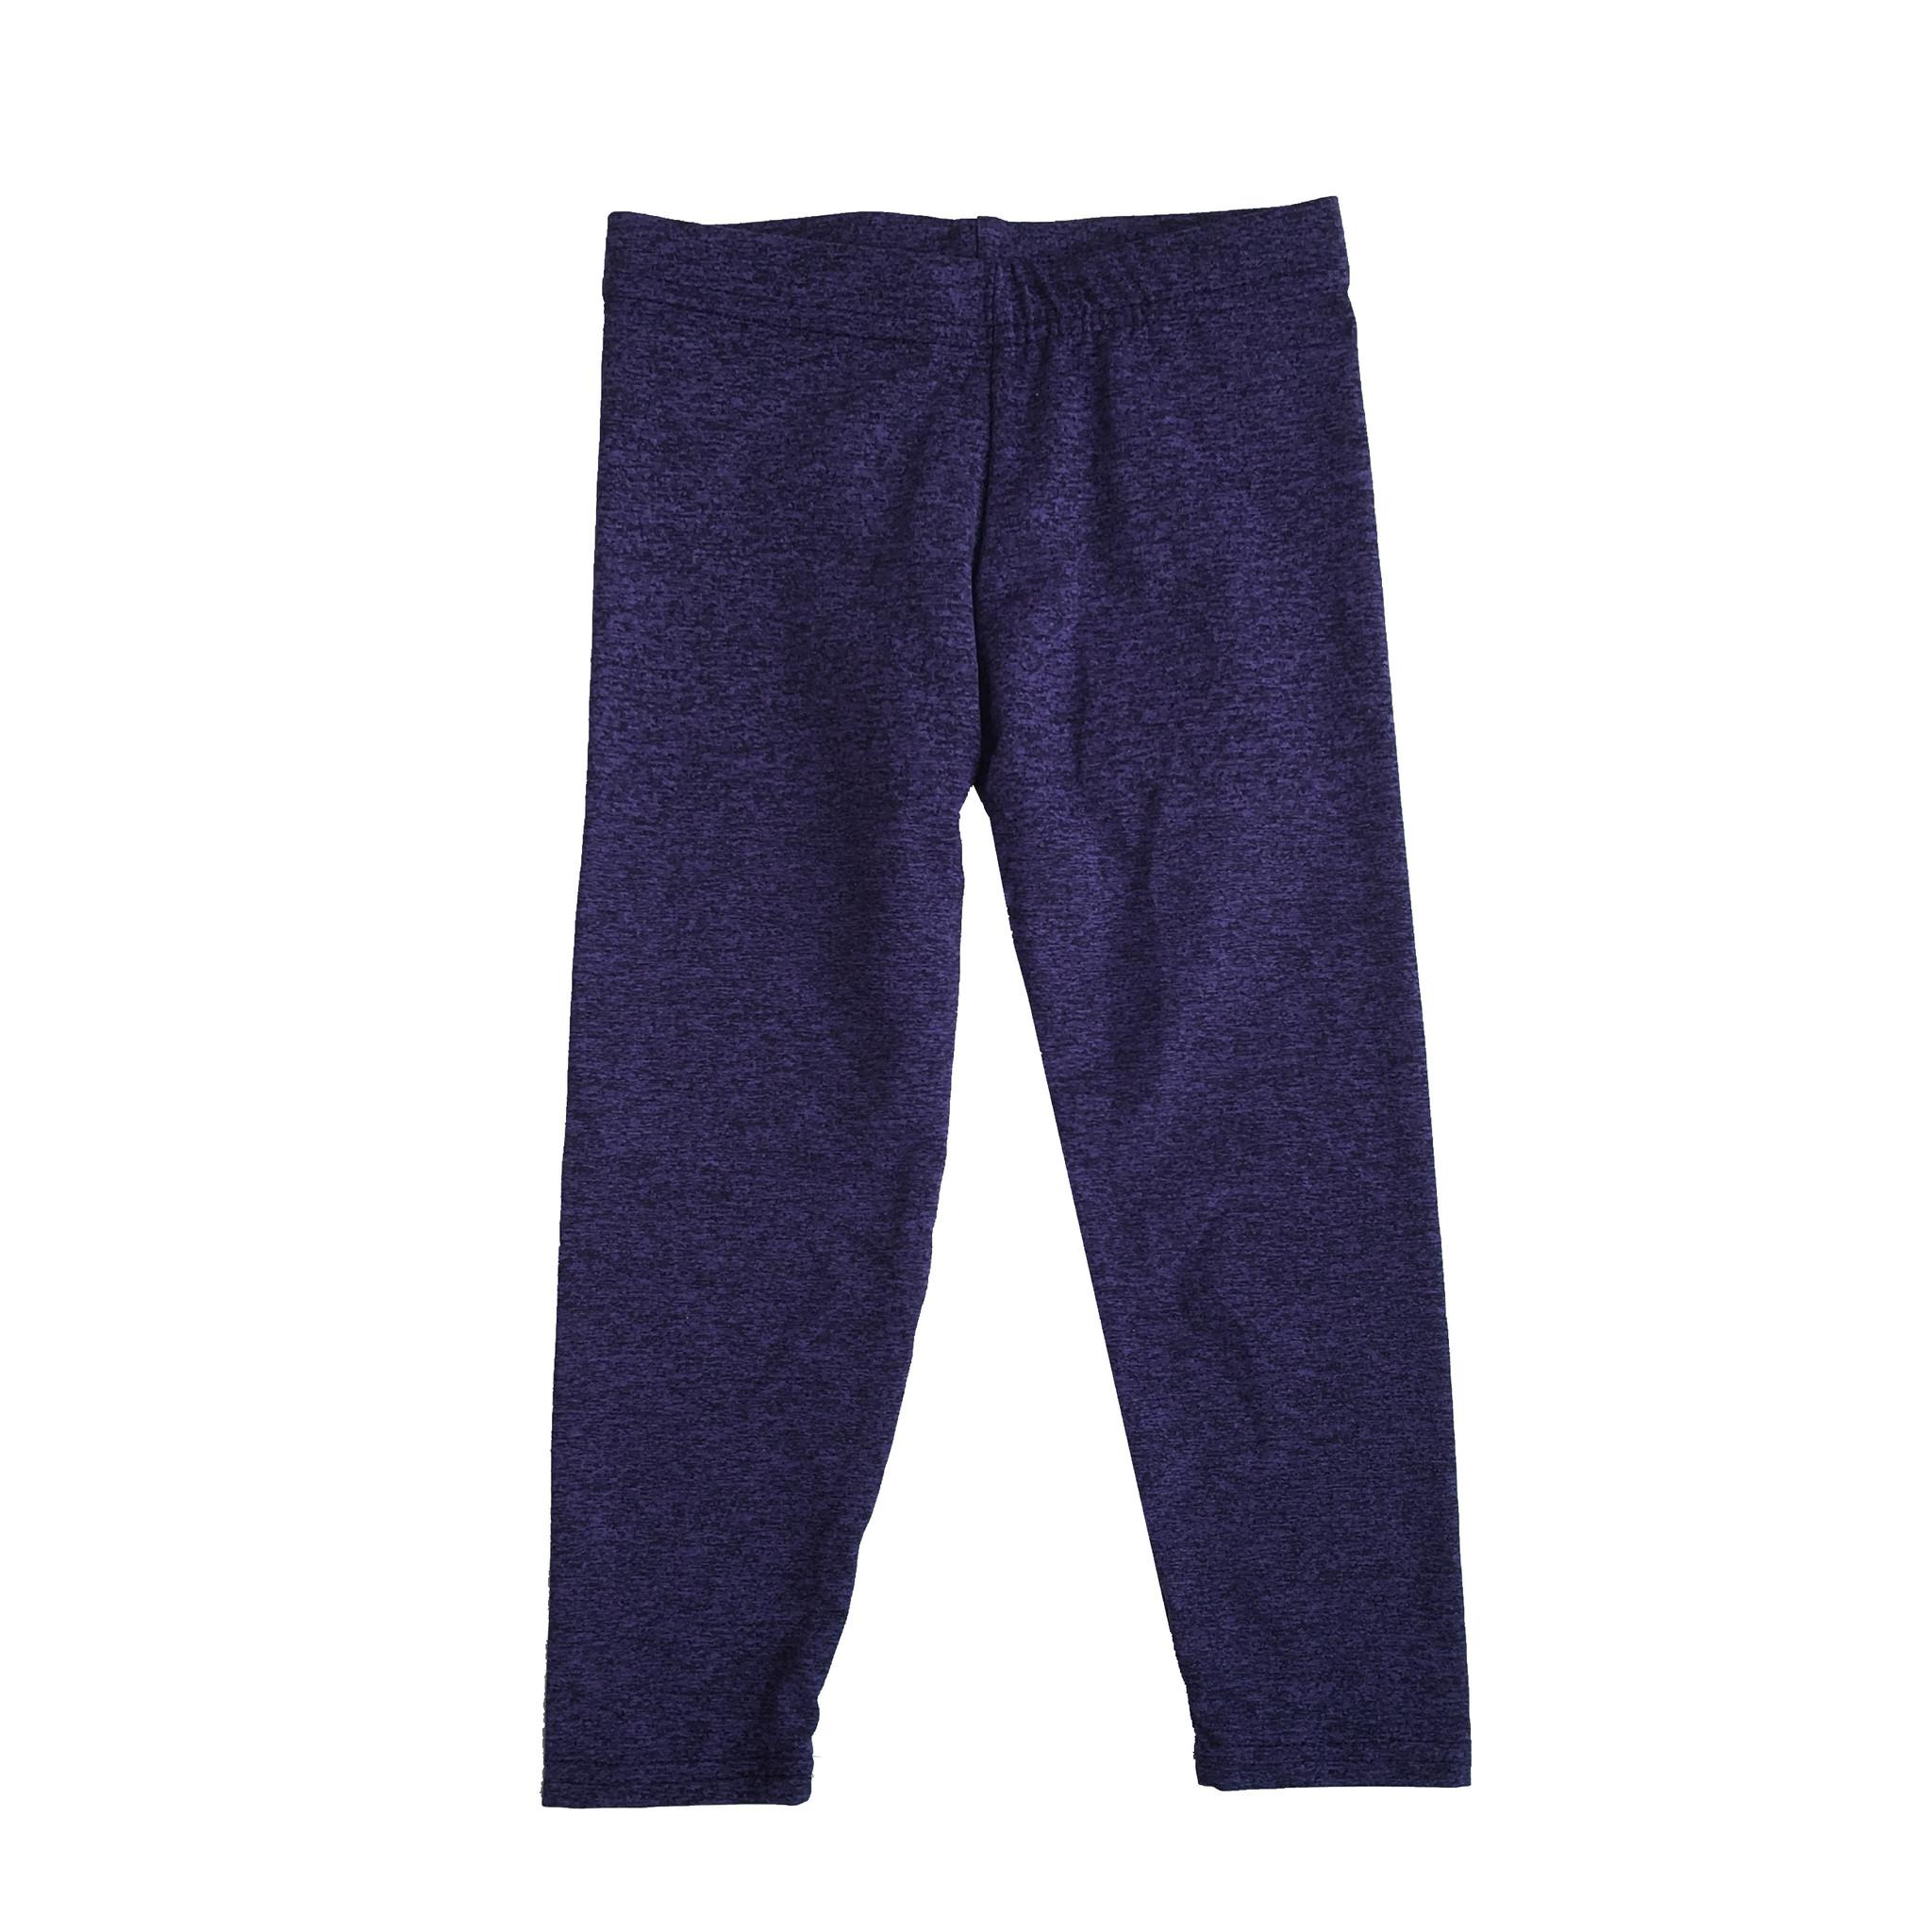 Dori Purple/Black Infant Heathered Legging